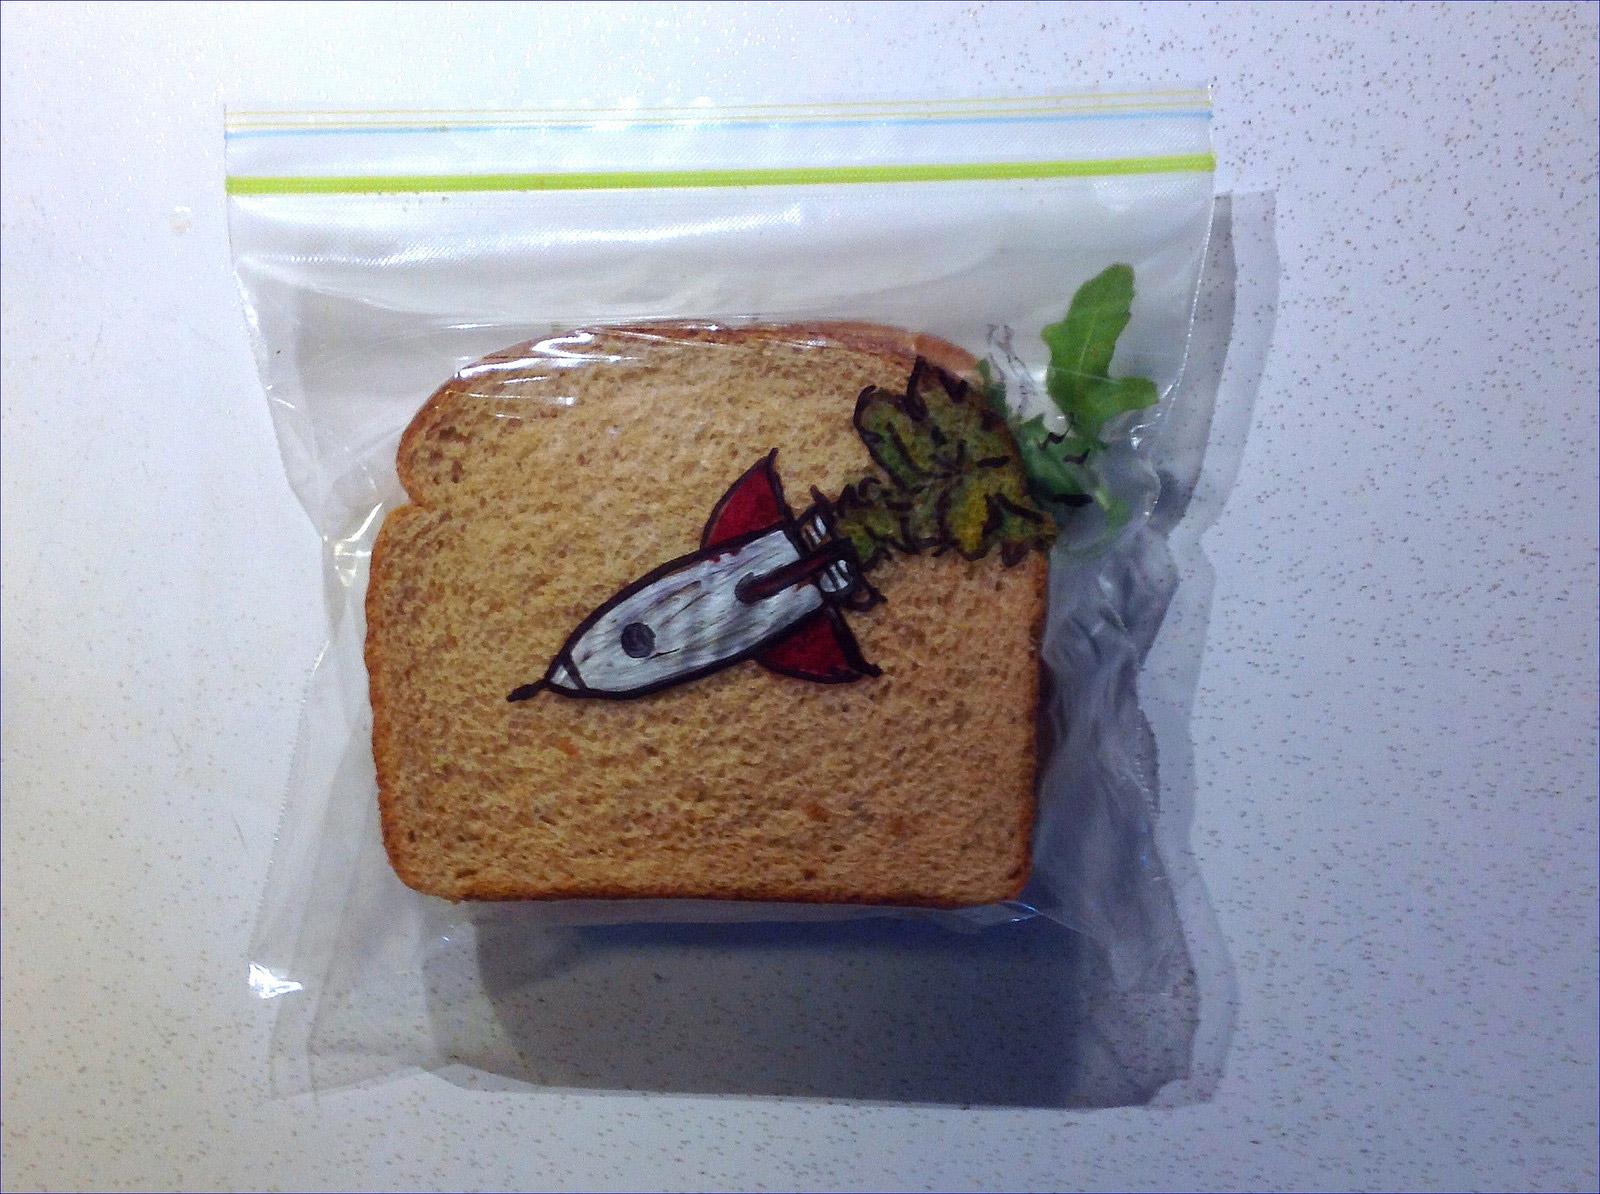 david-laferriere-creative-lunch-bag-illustration-13